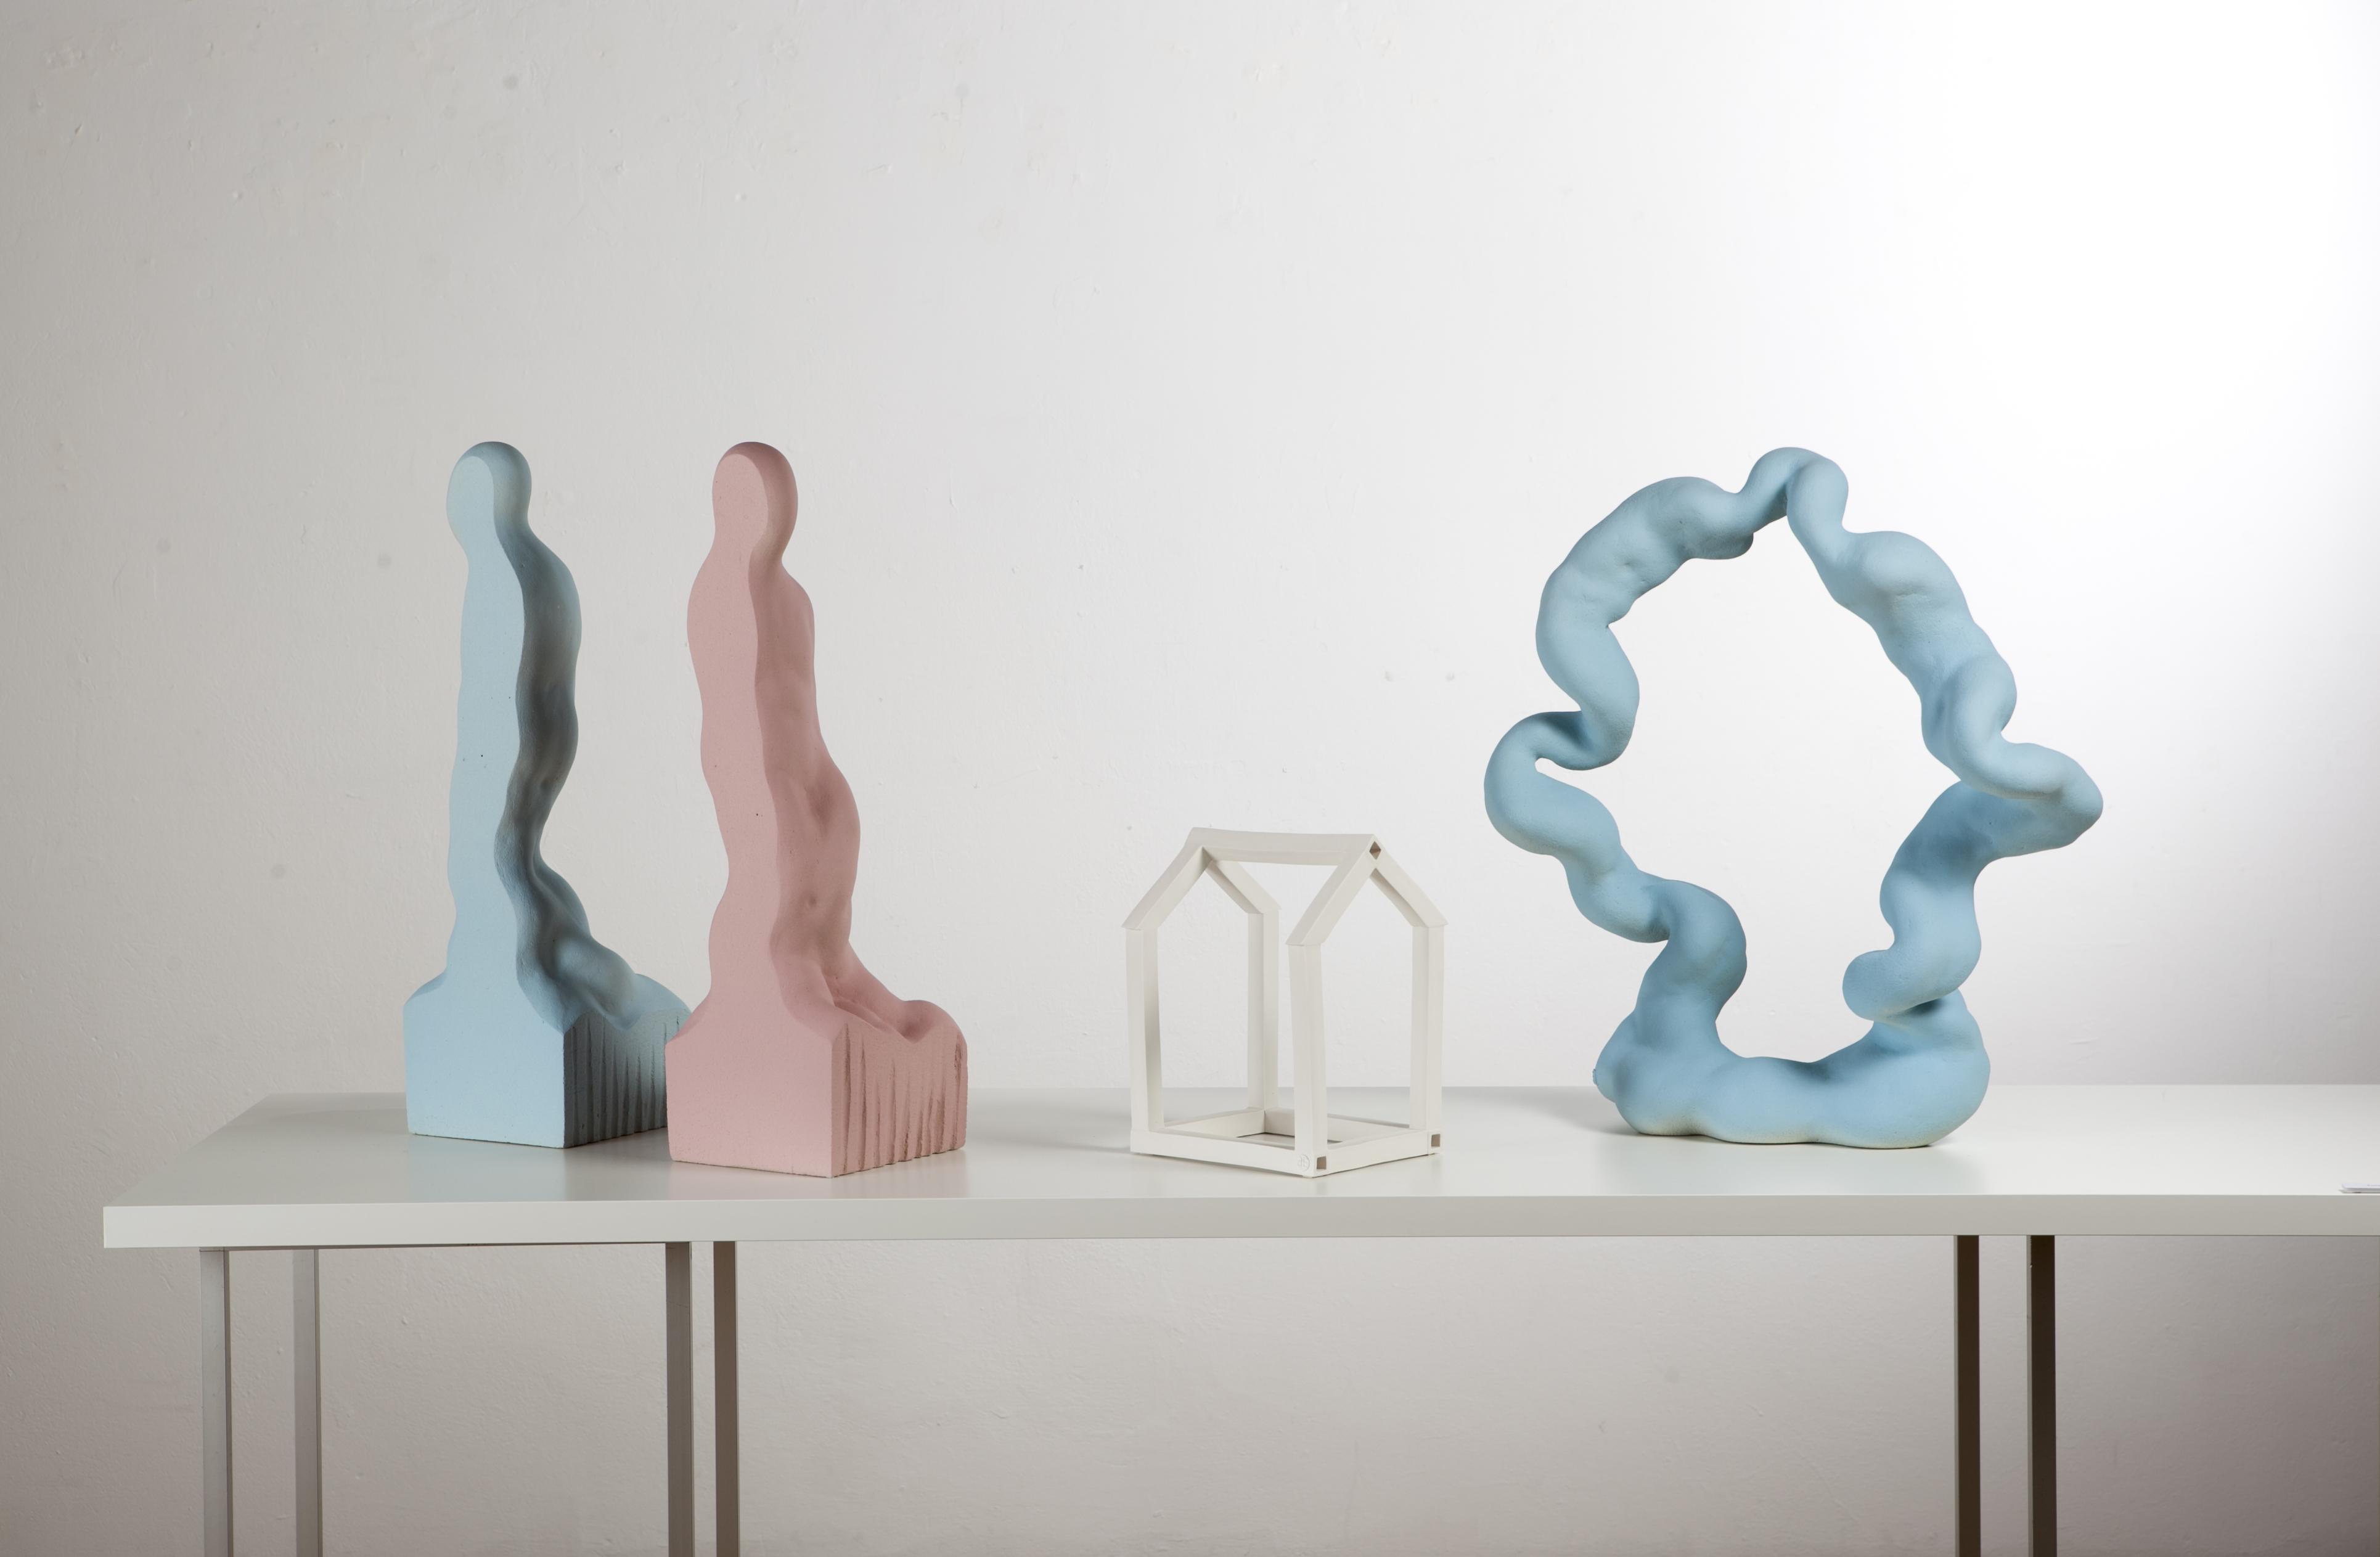 Iš kompozicijos InSide-OutSide I (From composition InSide-OutSide I ) , 2018, akmens masė, porcelianas(stoneware, porcelain) 120 x 50 cm, h 65 cm